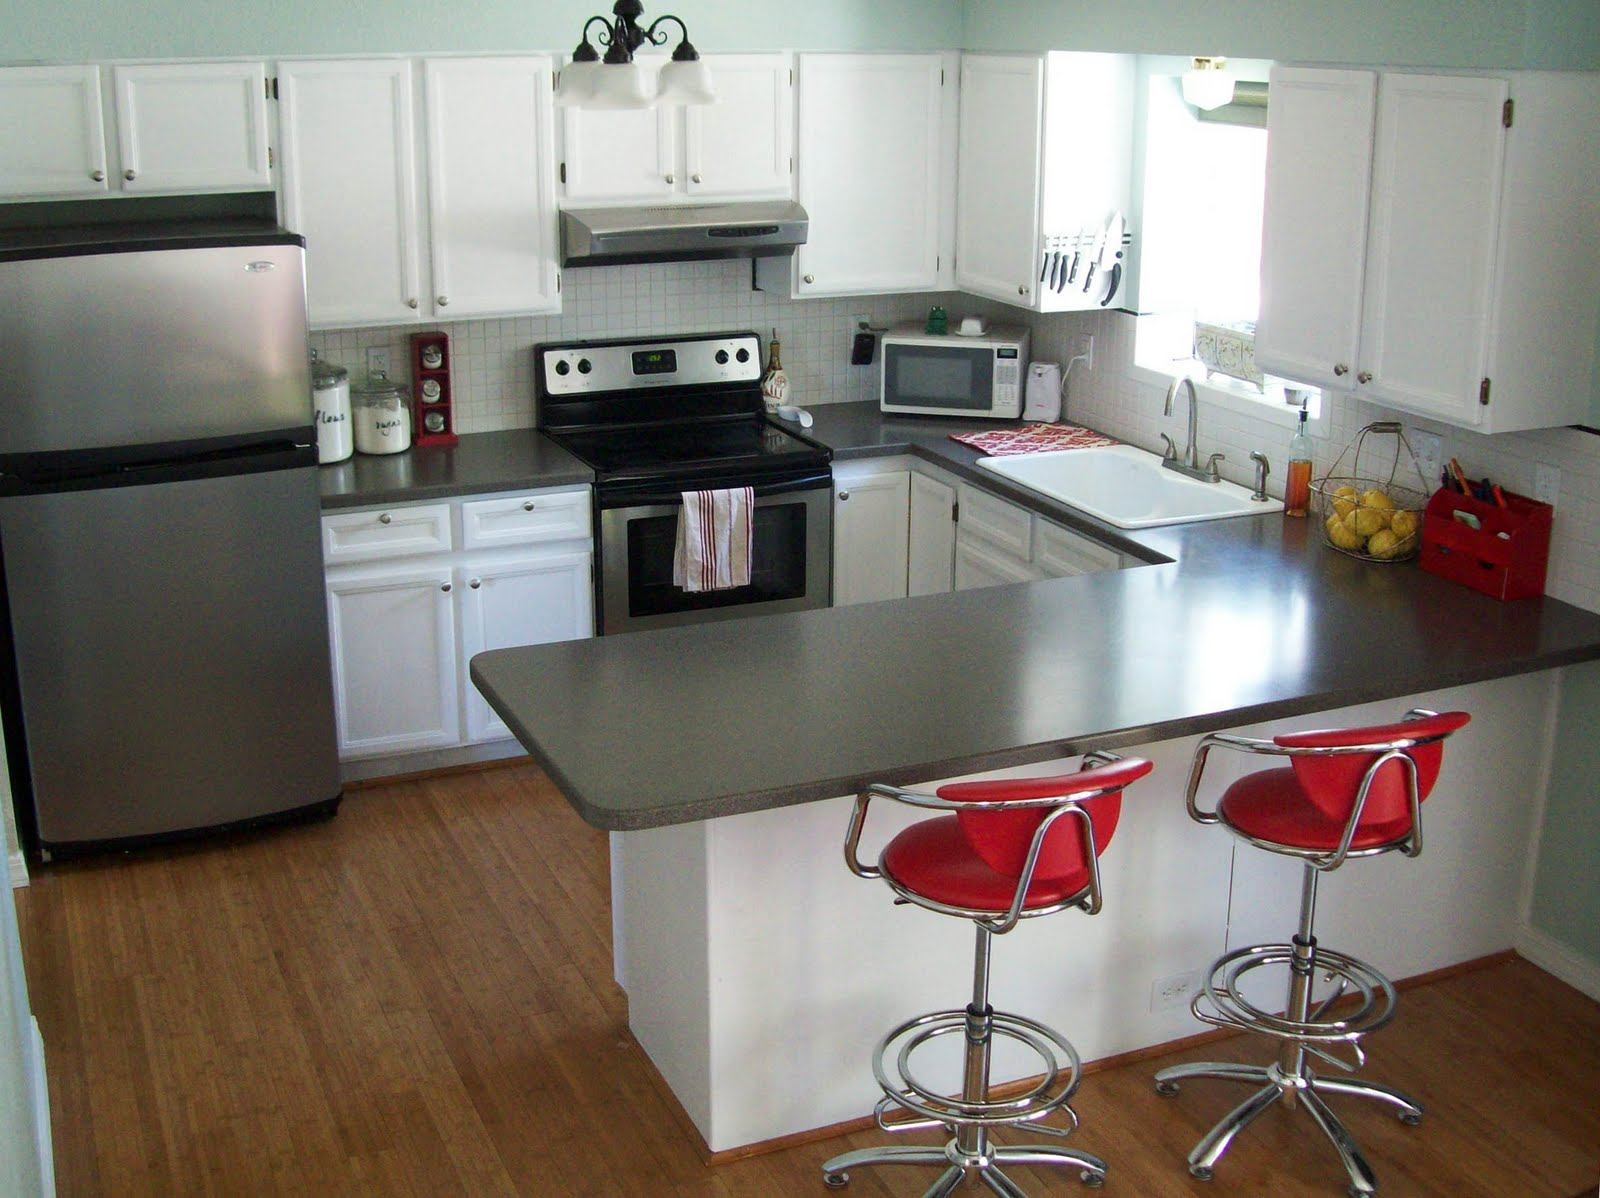 Black kitchen appliances Photo - 4